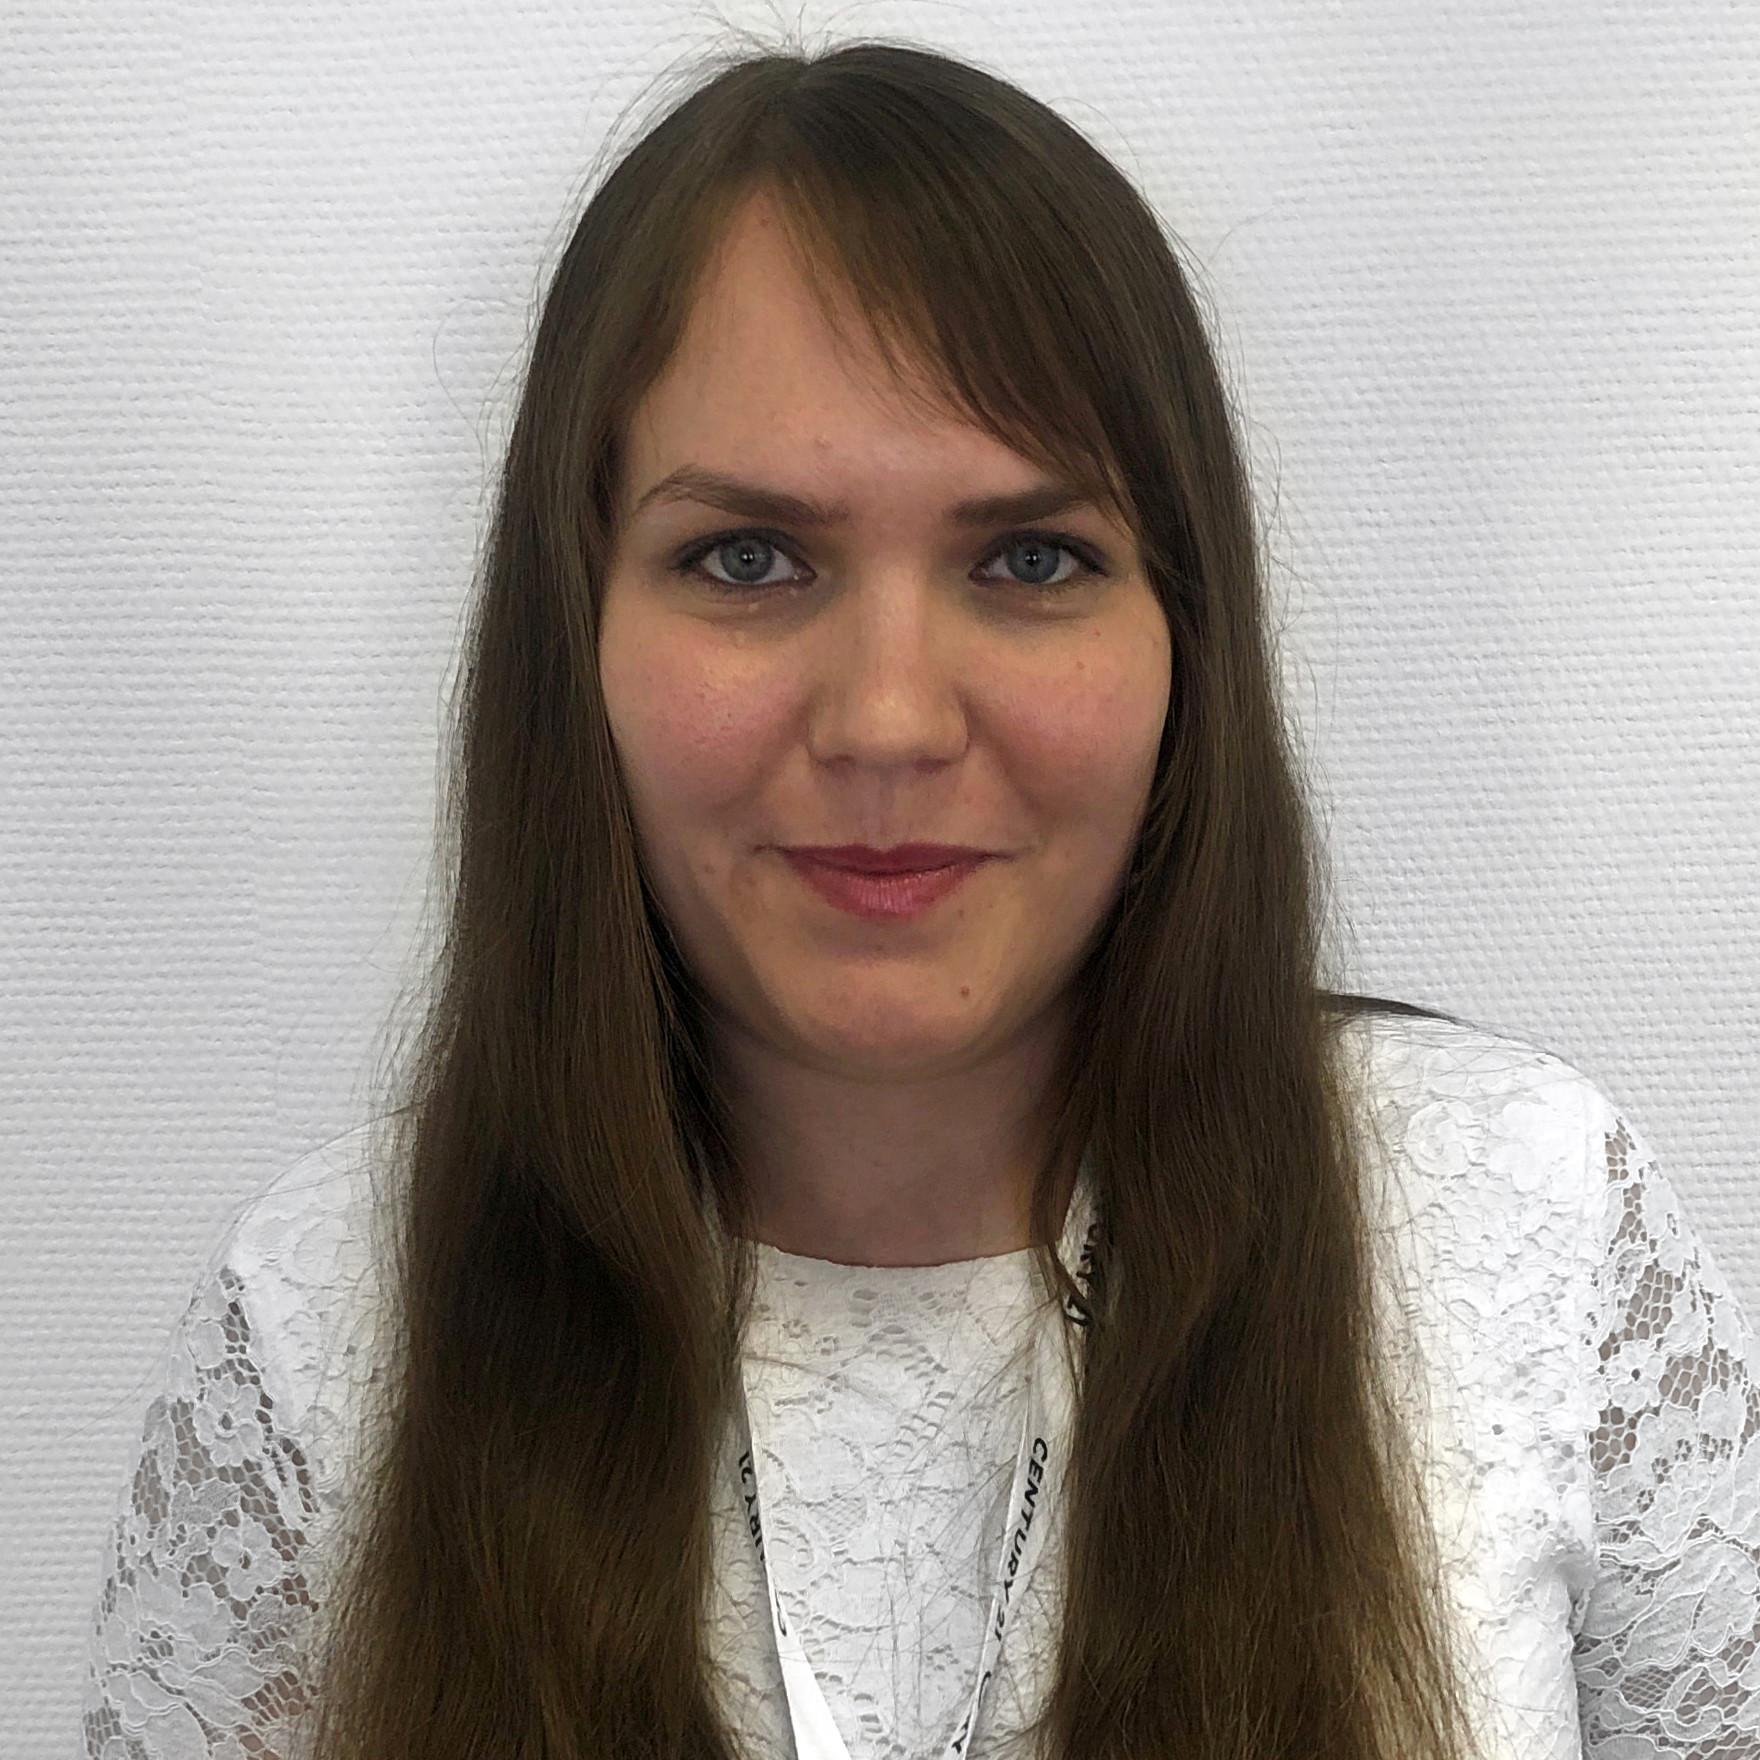 Караванова Татьяна